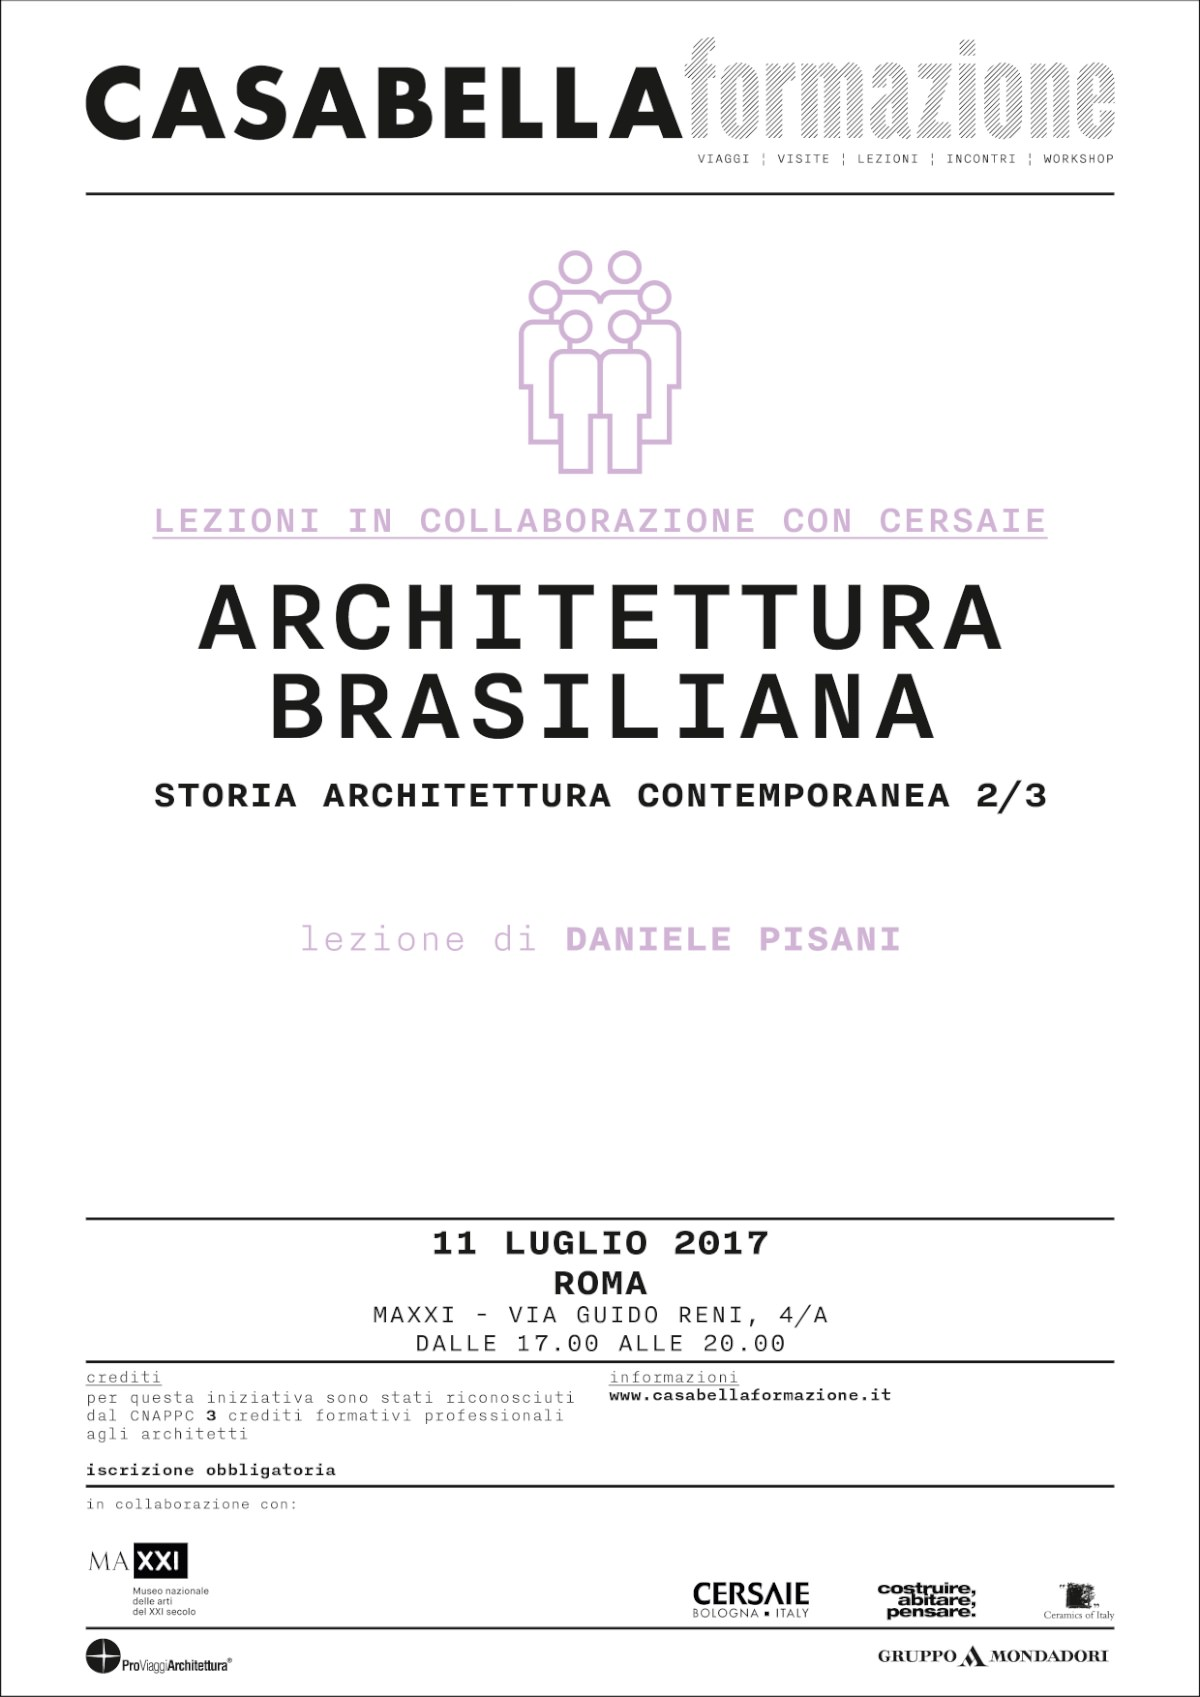 Daniele Pisani «Architettura Brasiliana»